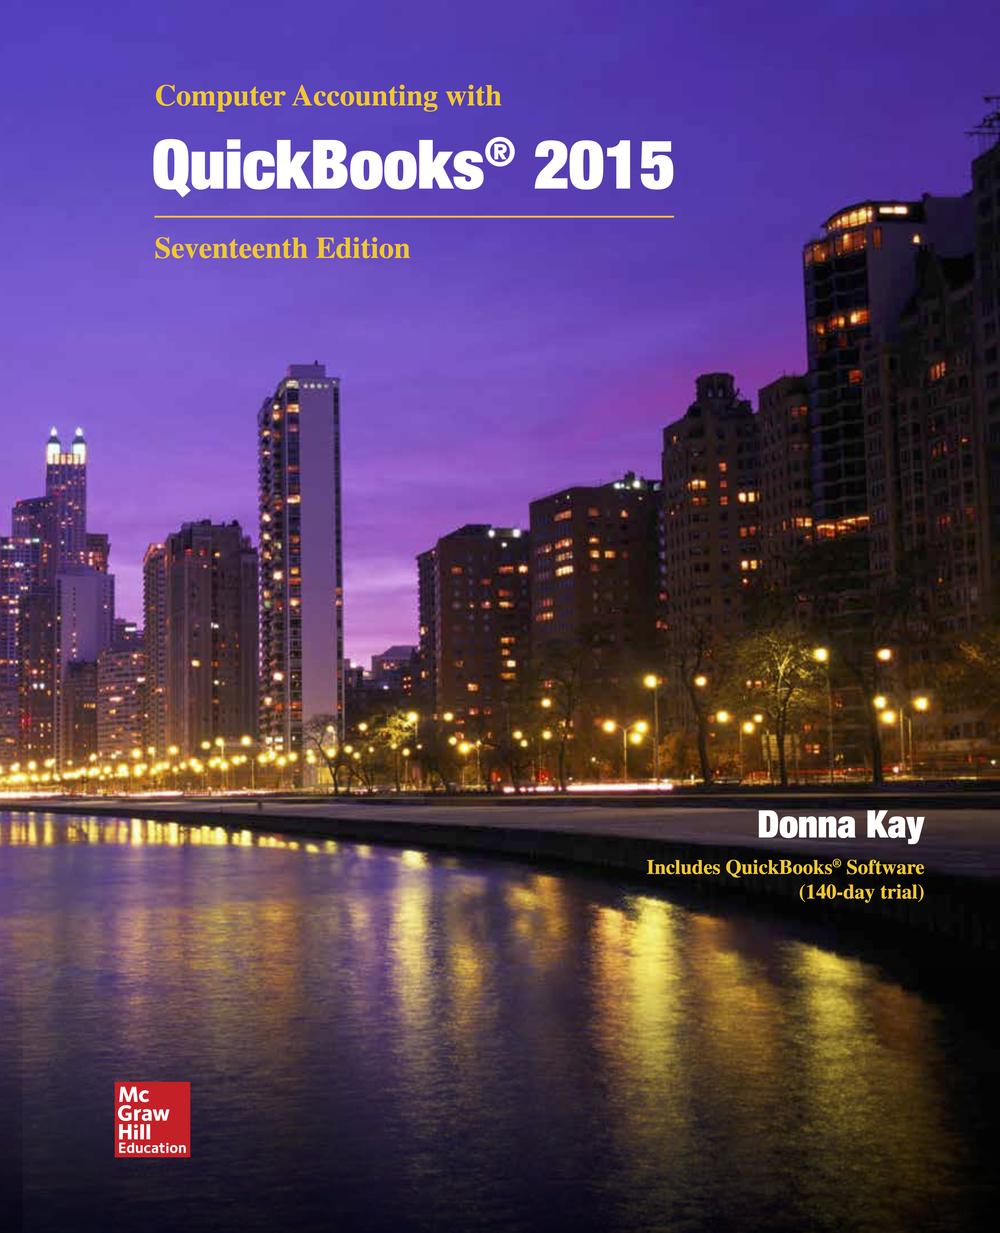 how do i download quickbooks 2015